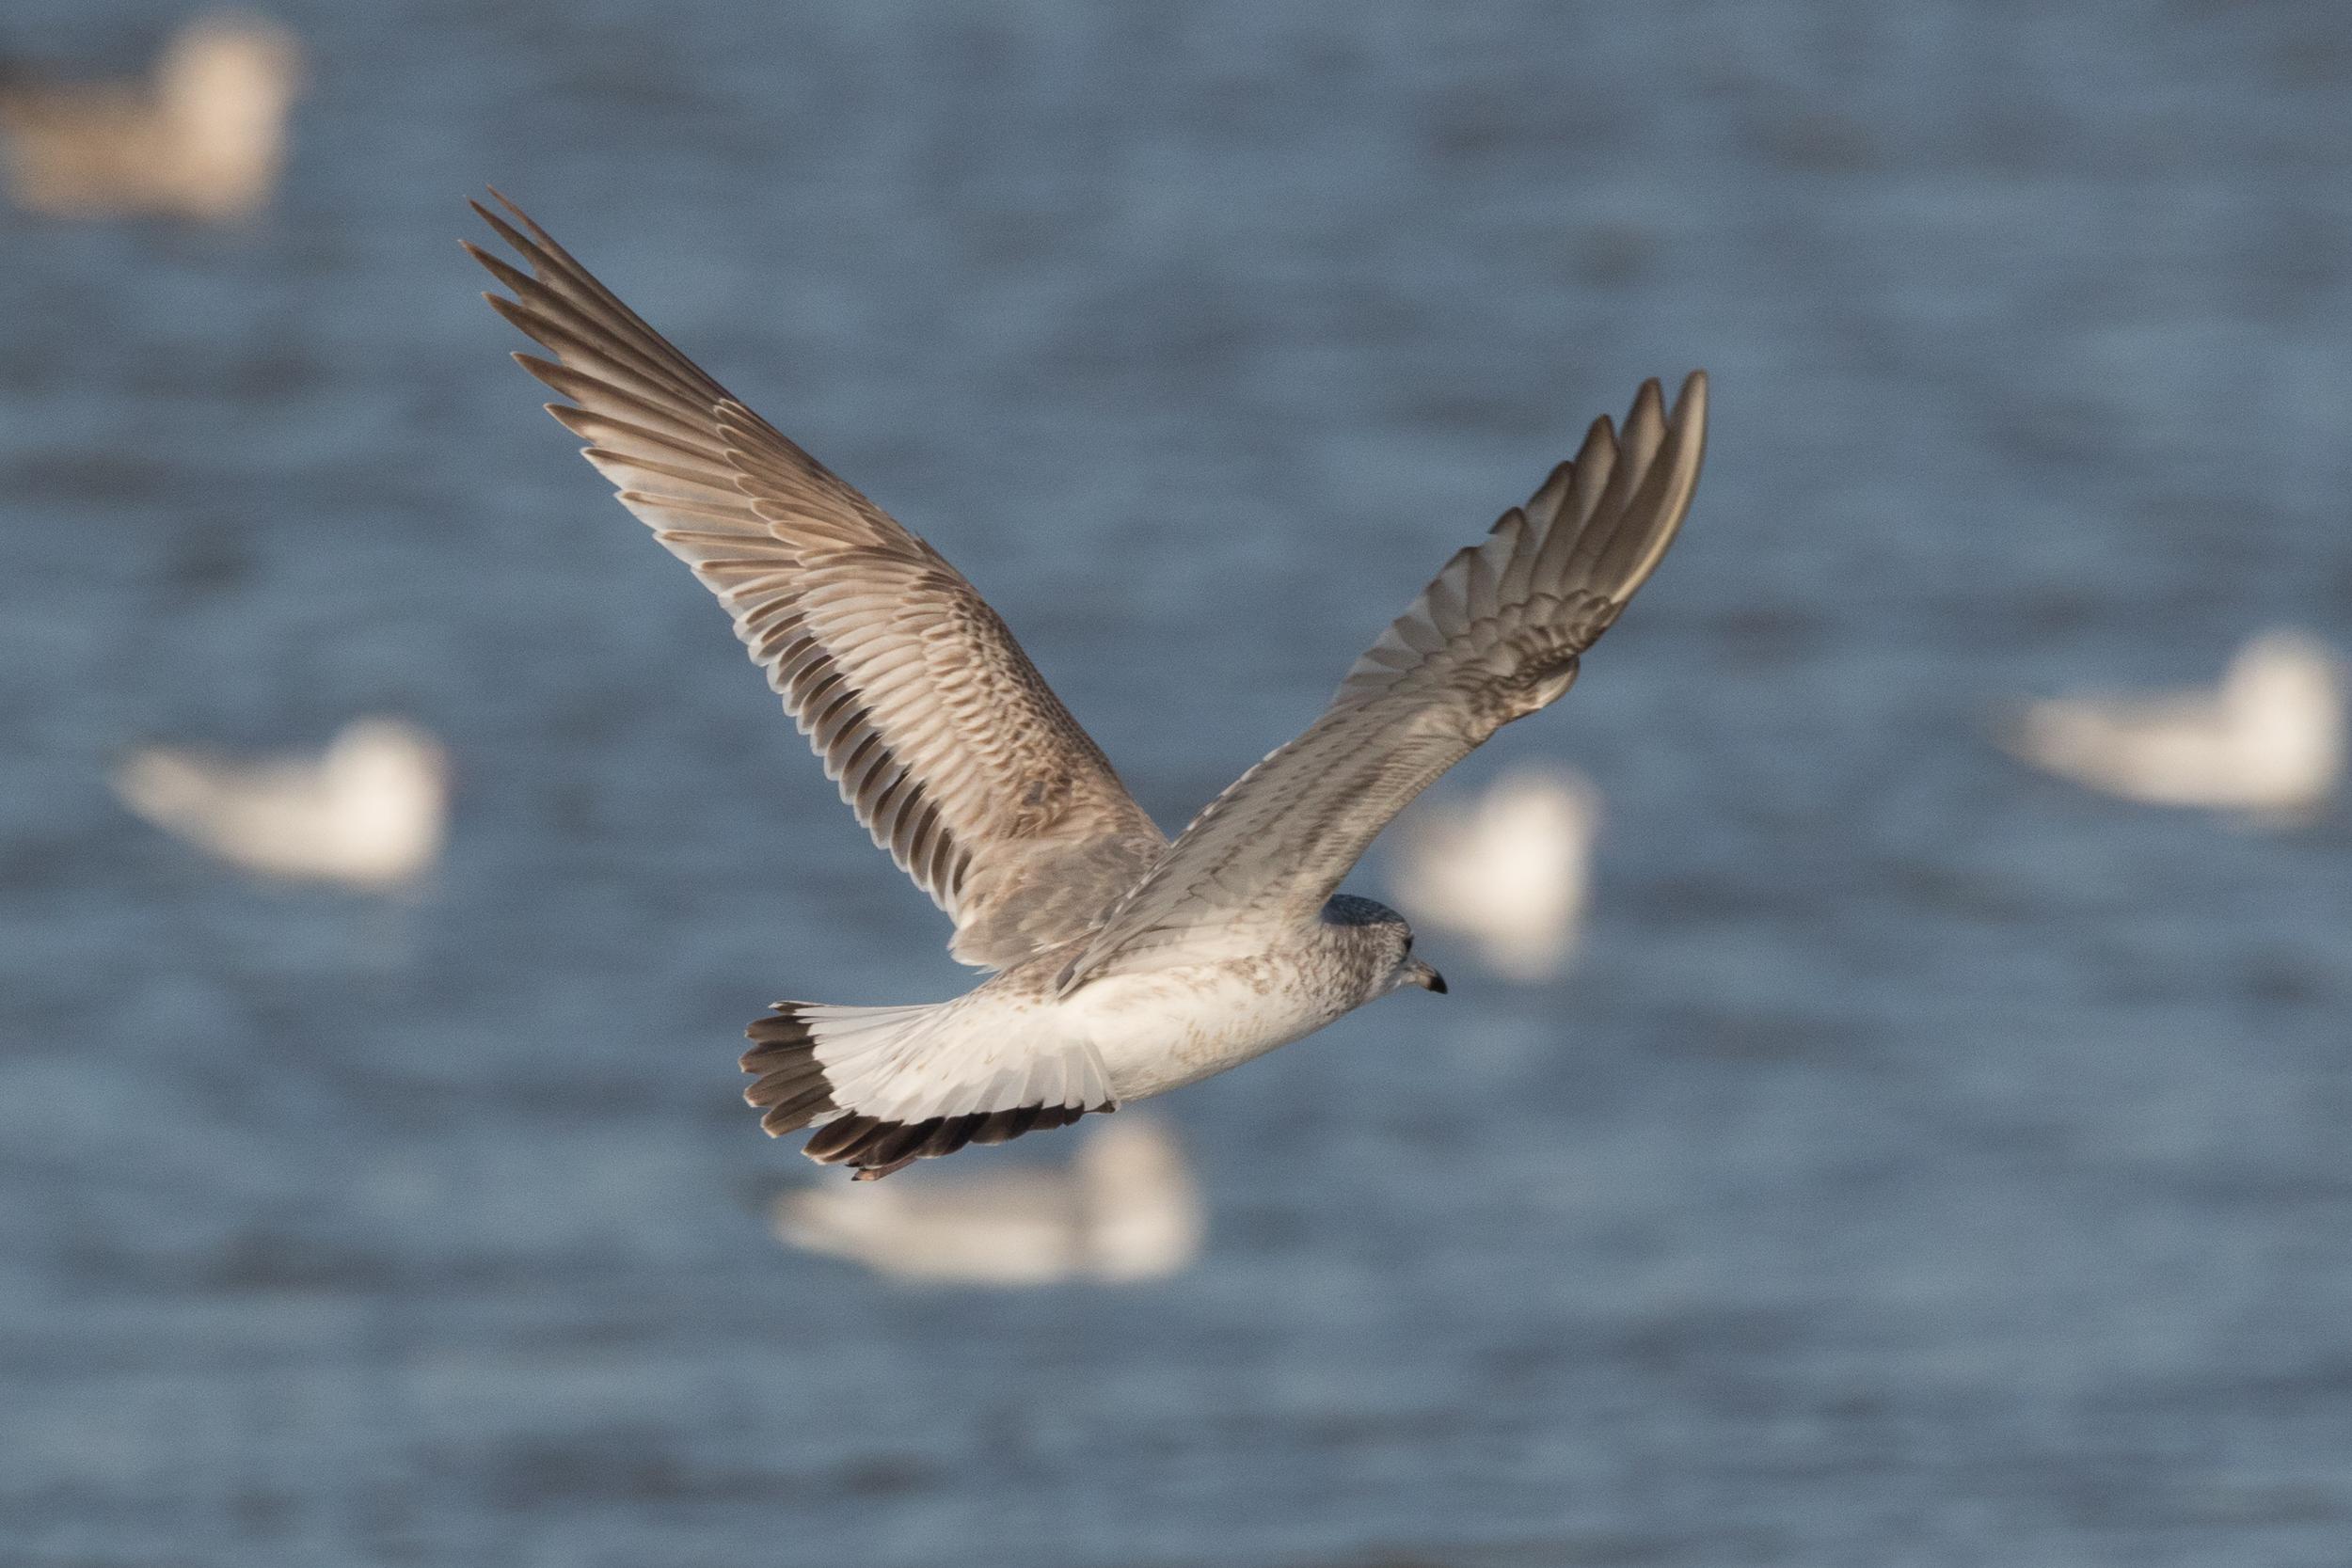 20170121-Common Gull 2CY-18.jpg